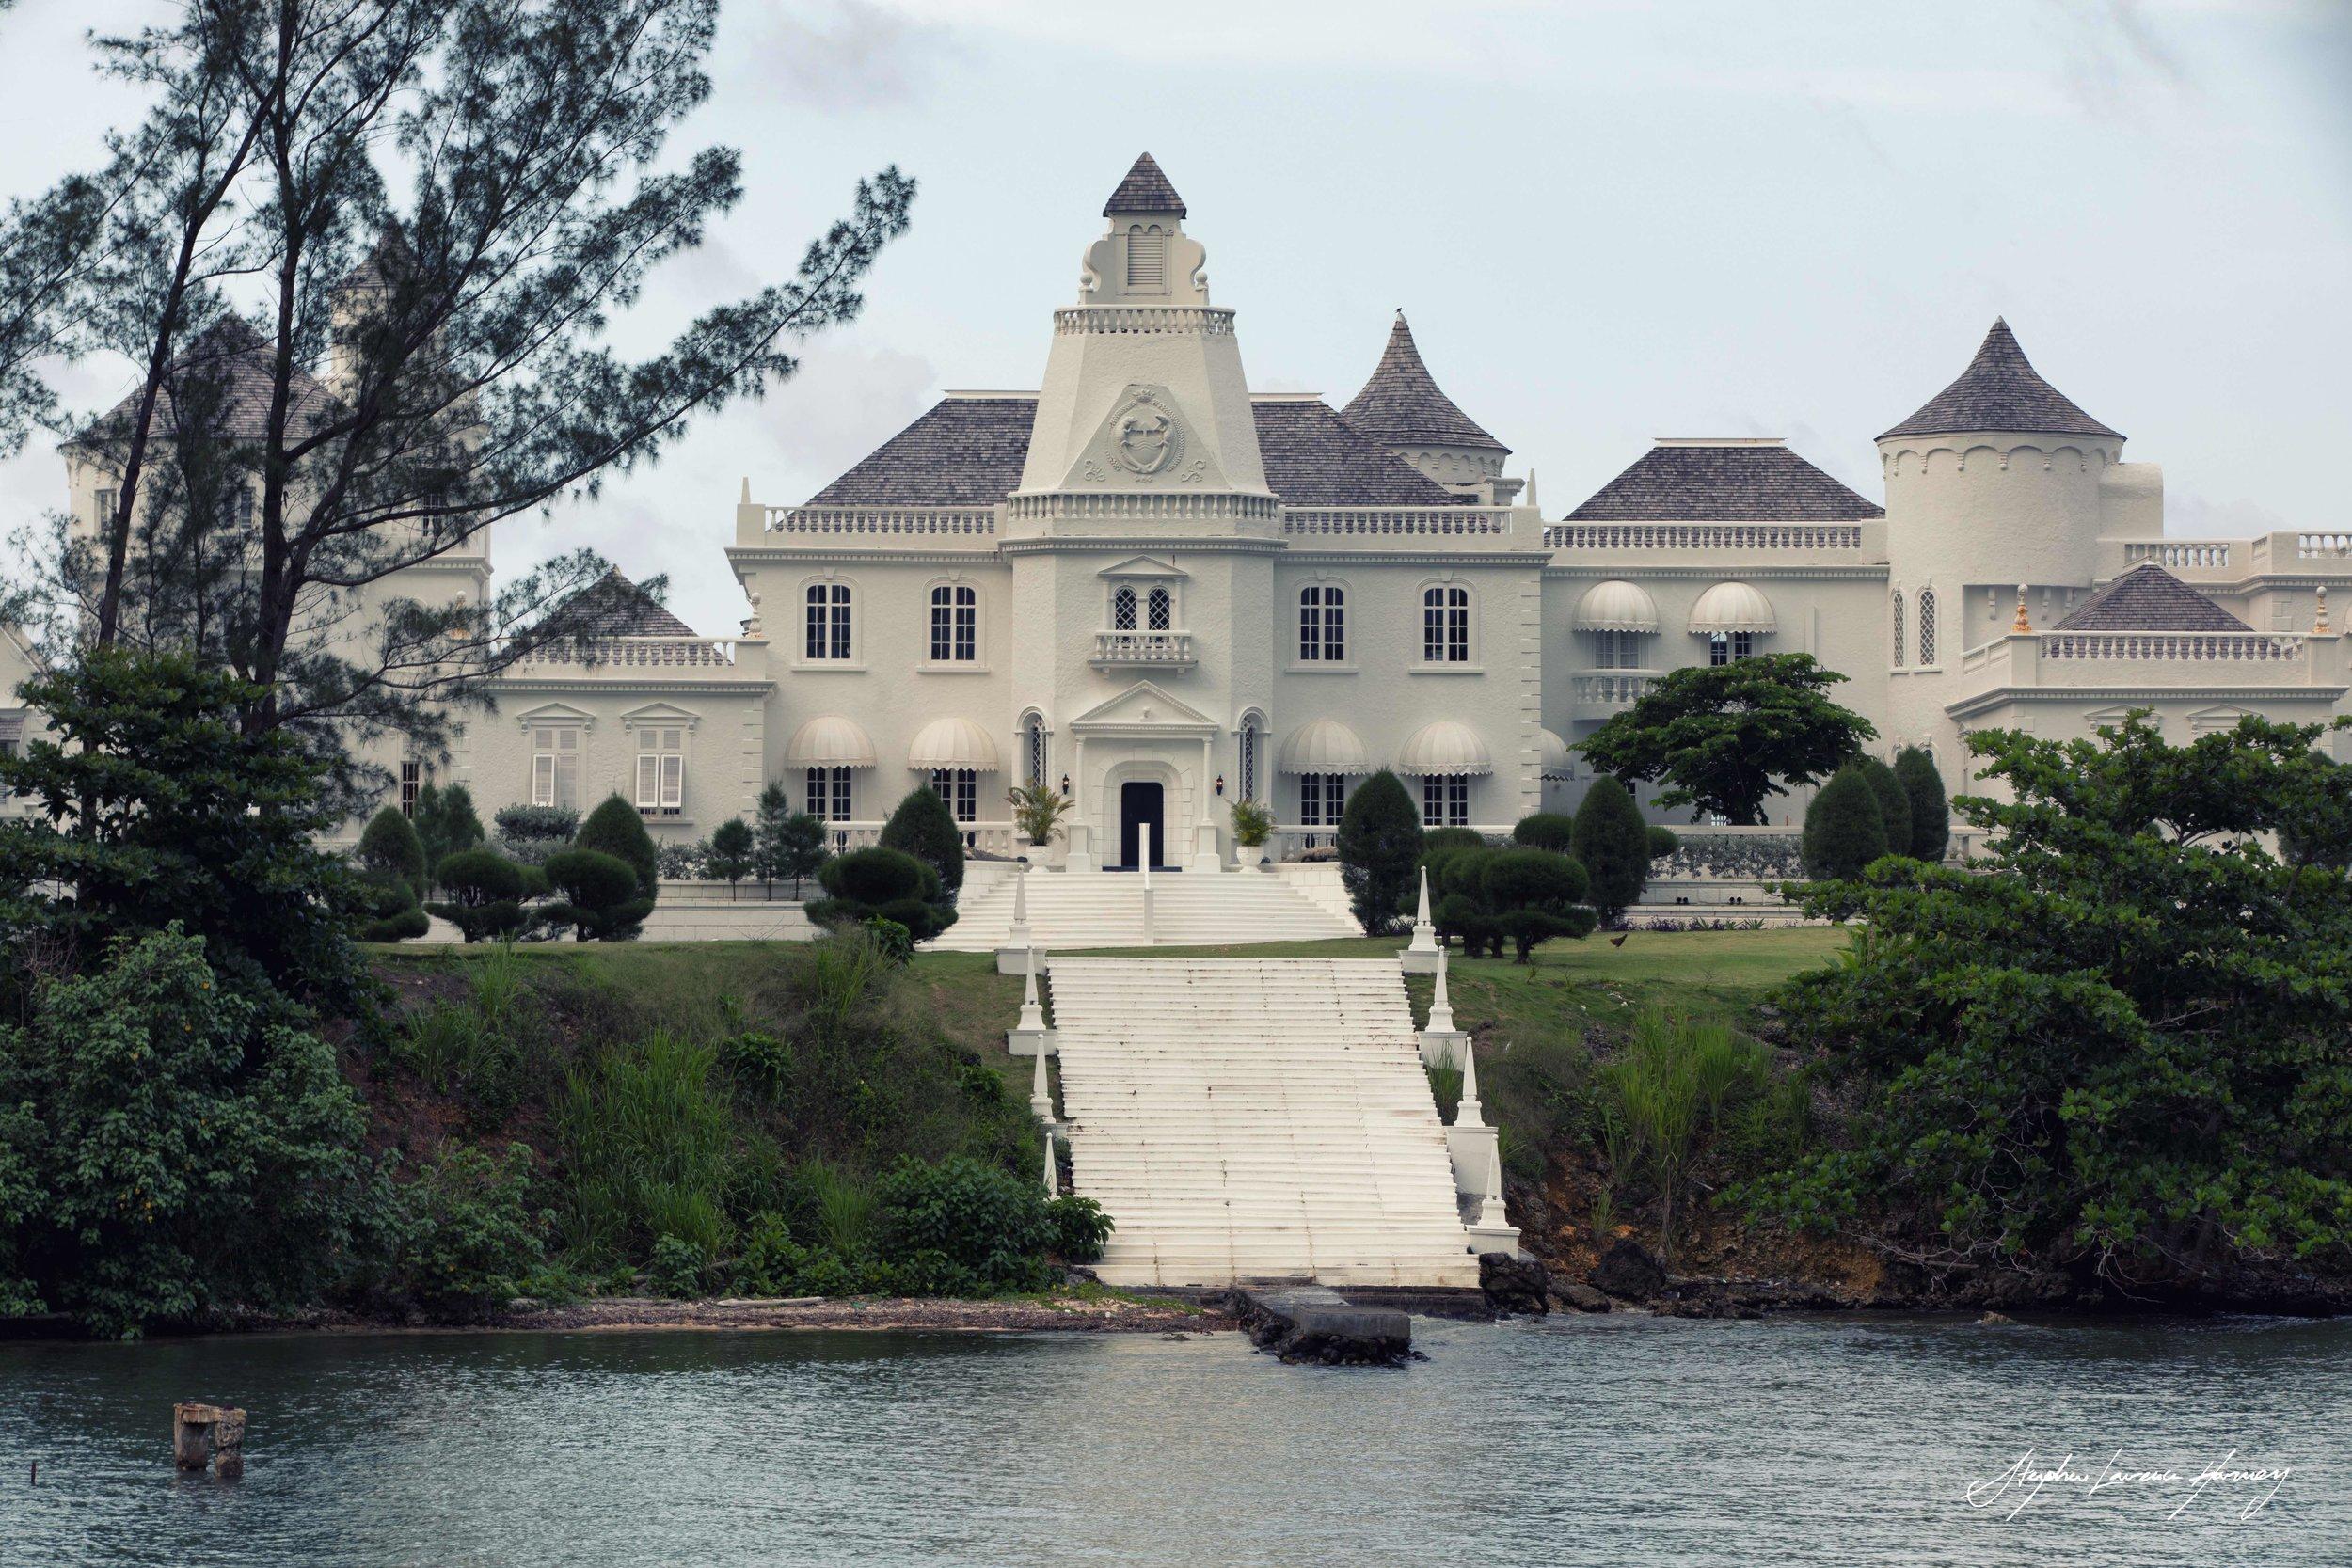 Mansion in Jamaica 2 (1 of 1) copy.jpg